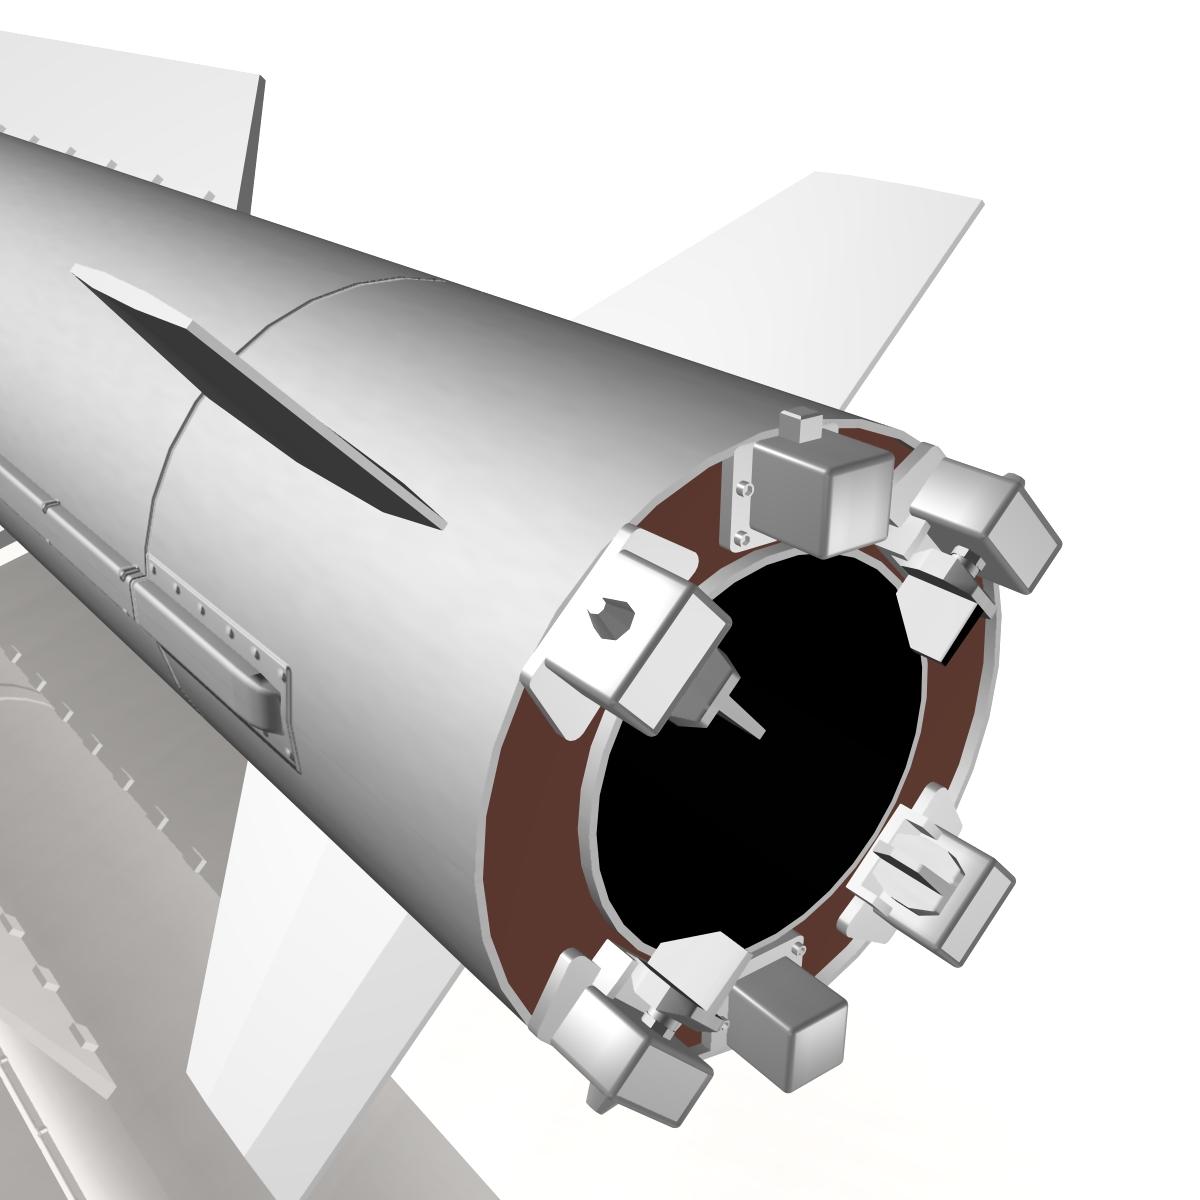 БНХАУ-ын С-400 пуужин 3d загвар 3ds dxf cob x obj 157968